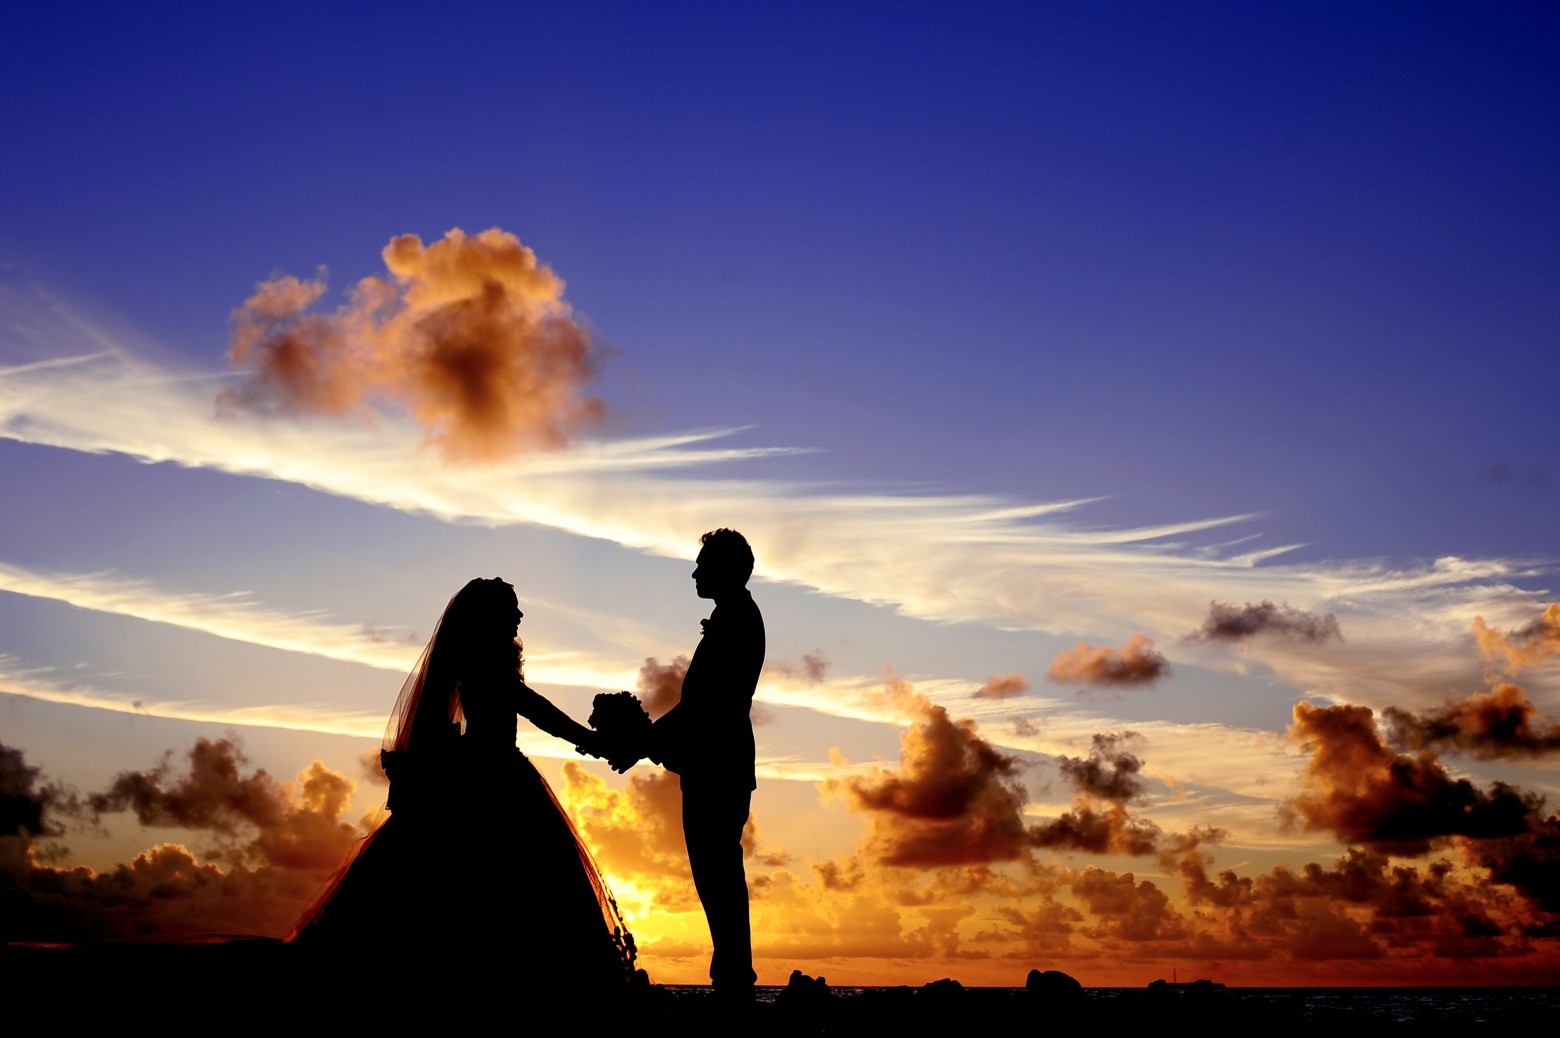 Maldives-sunset-wedding4587-1560x1038